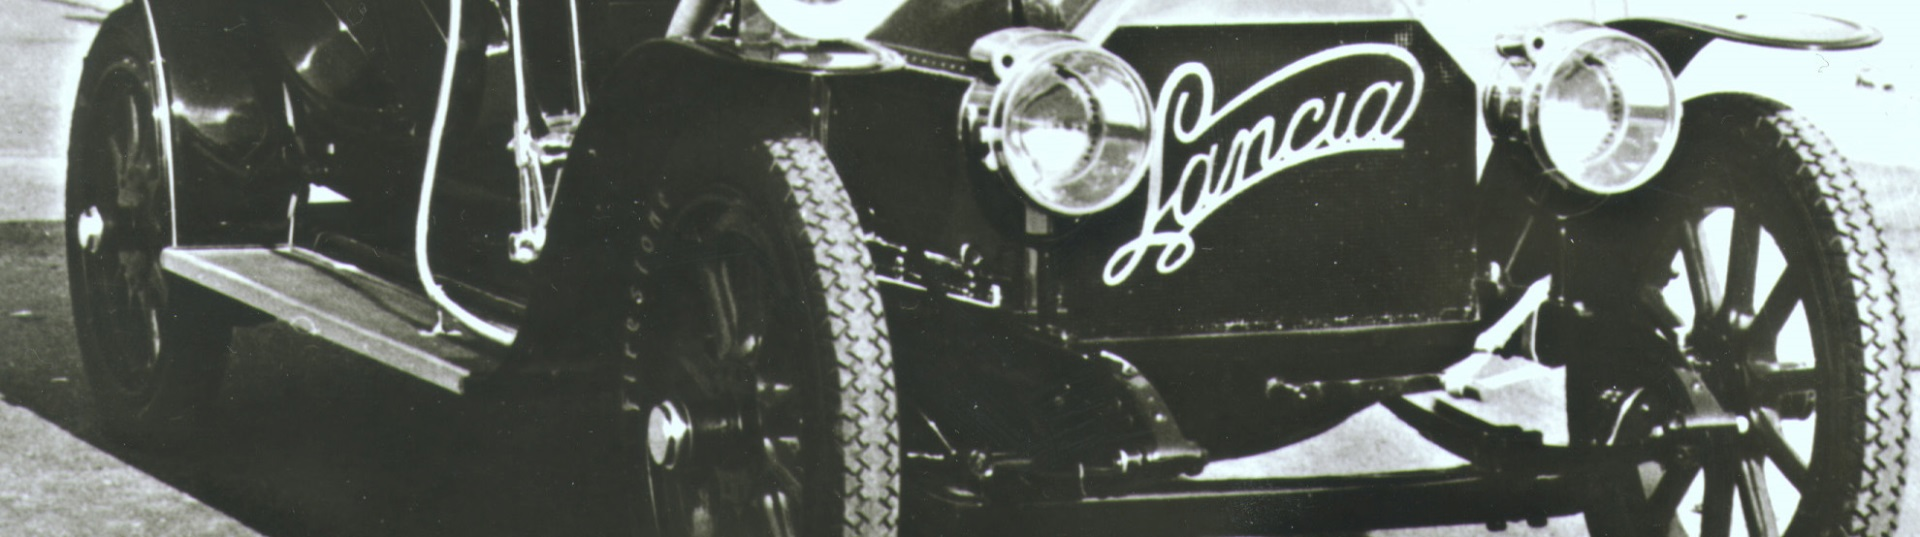 Lancia Alpha_1907_1920